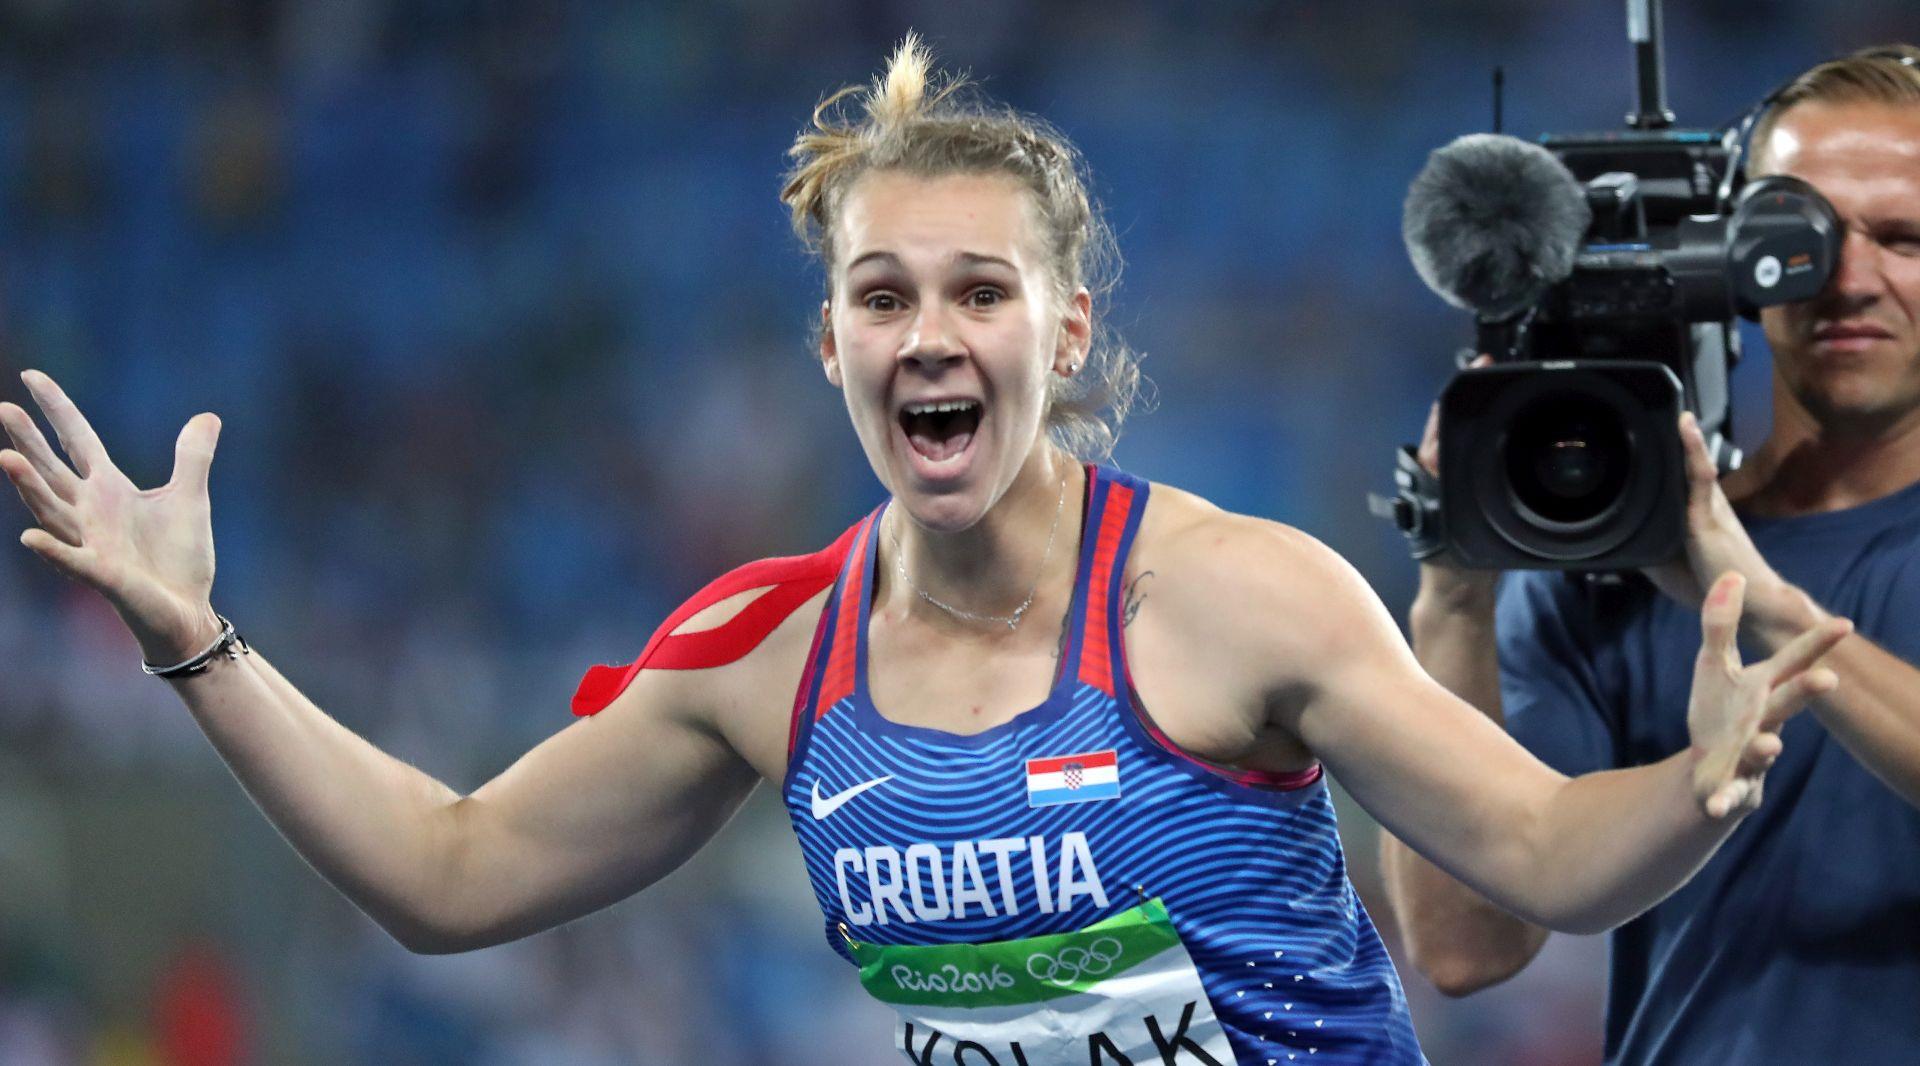 ATLETSKO SP Šest hrvatskih atletičarki i trojica atletičara u Londonu